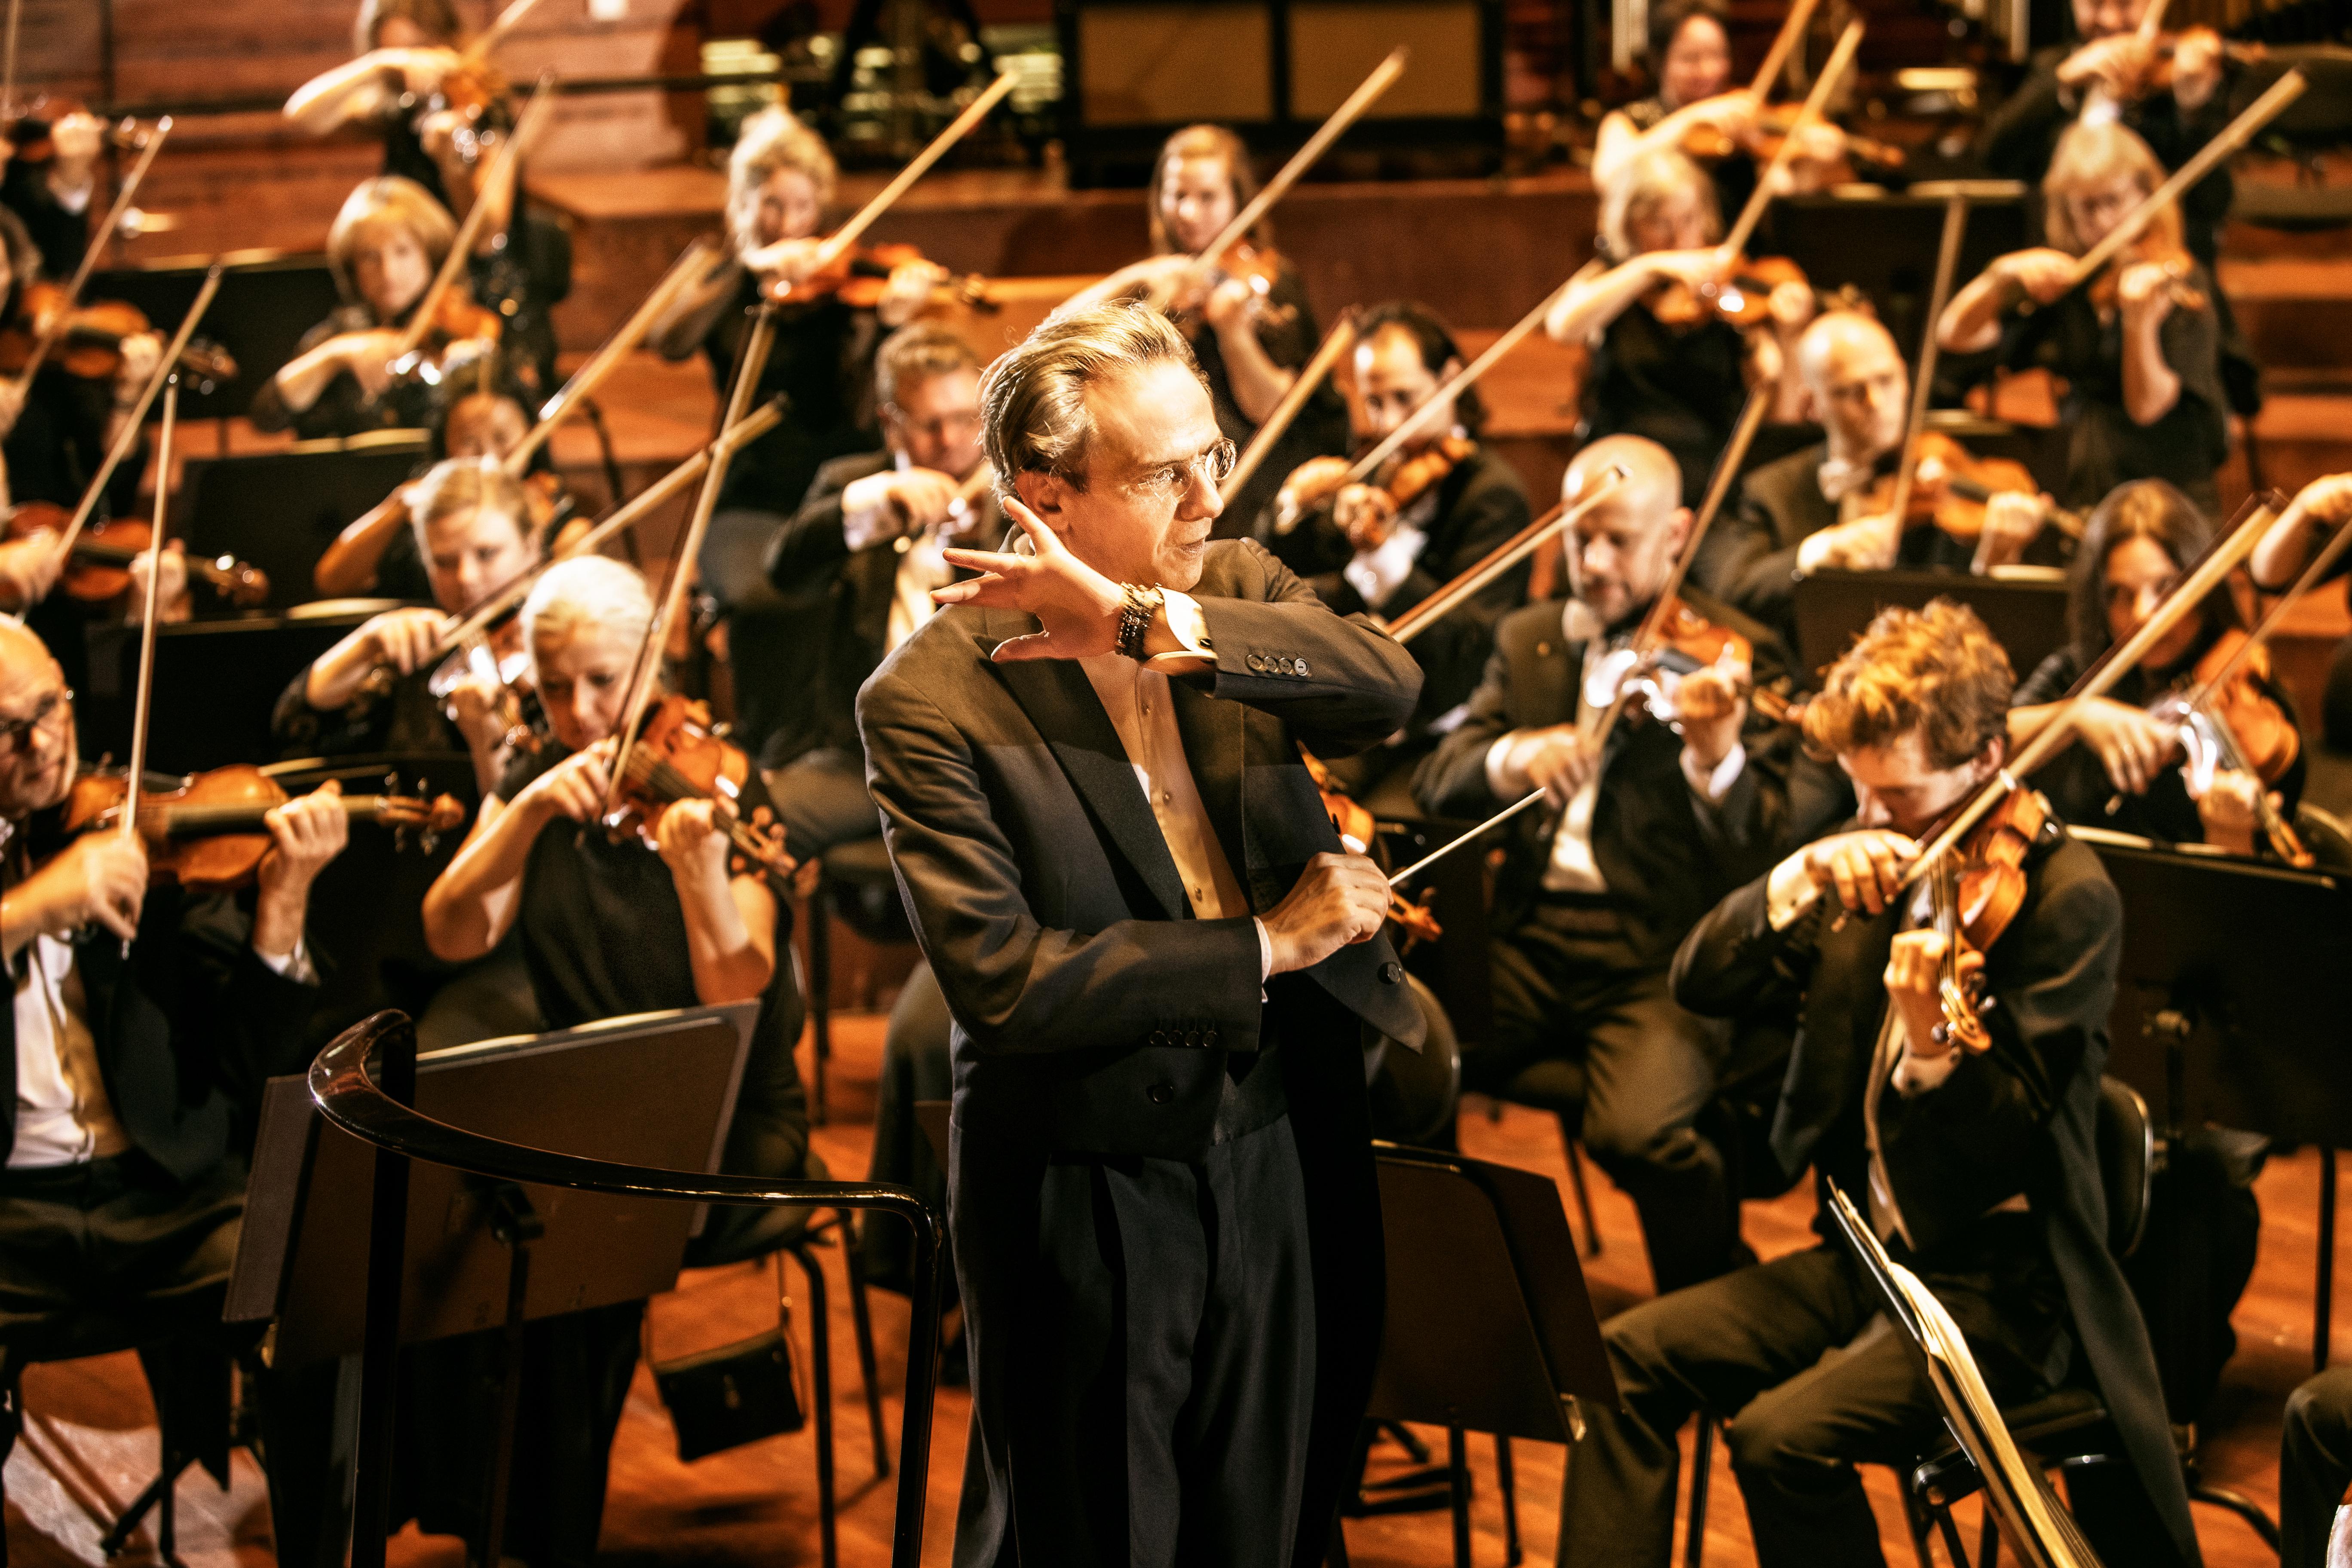 dr symfoniorkester program